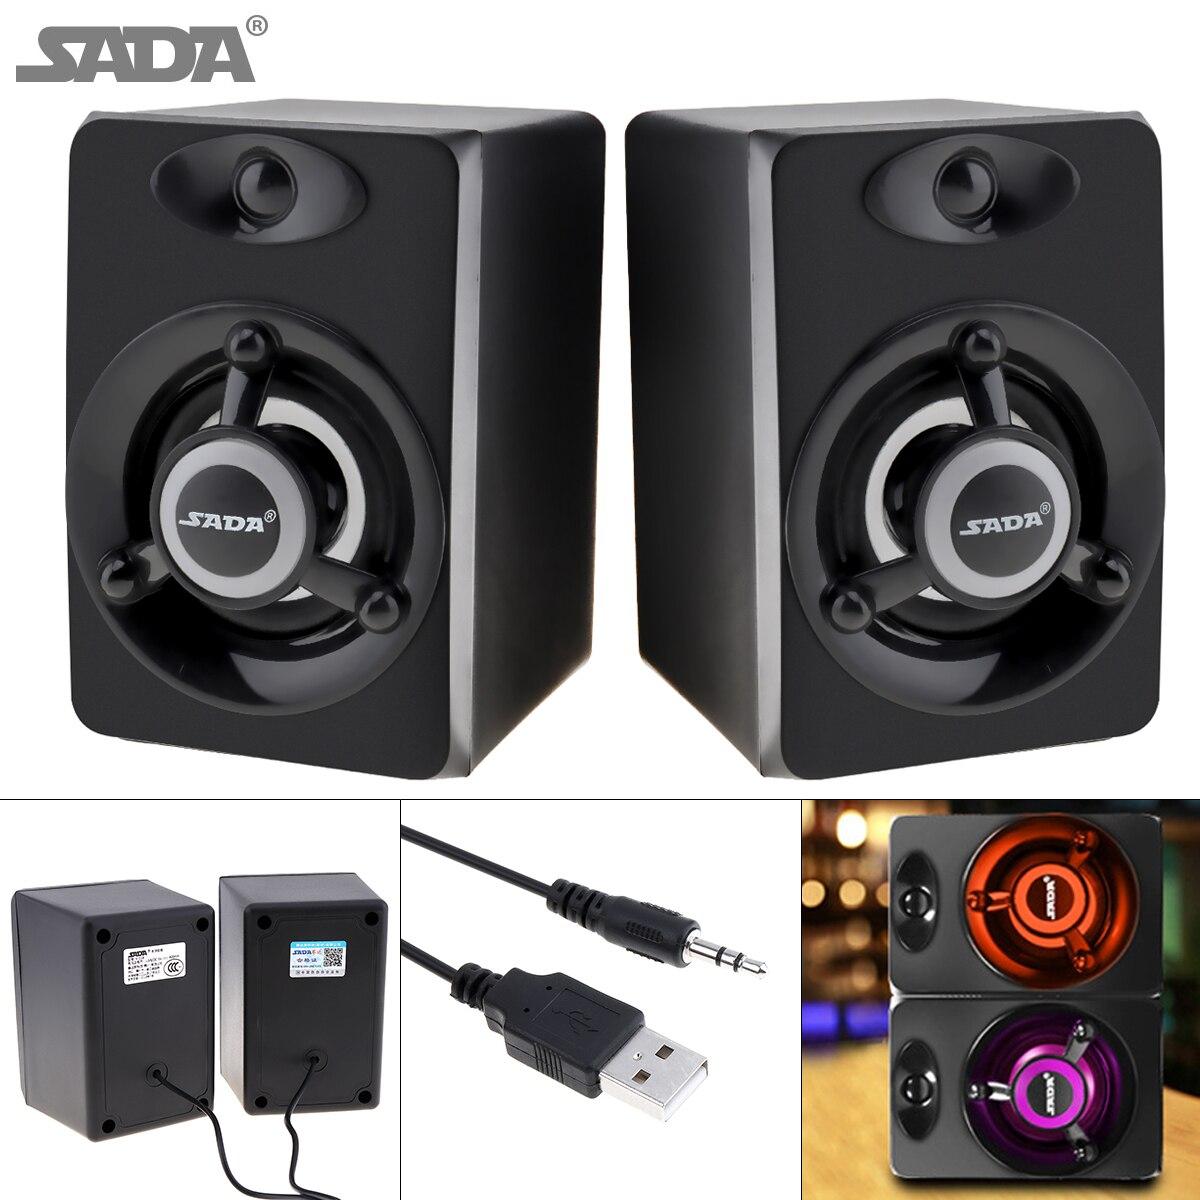 SADA 2018 Newest Subwoofer Deep Bass PC Speaker Portable Music DJ USB Soundar Computer Speakers For laptop Phone TV